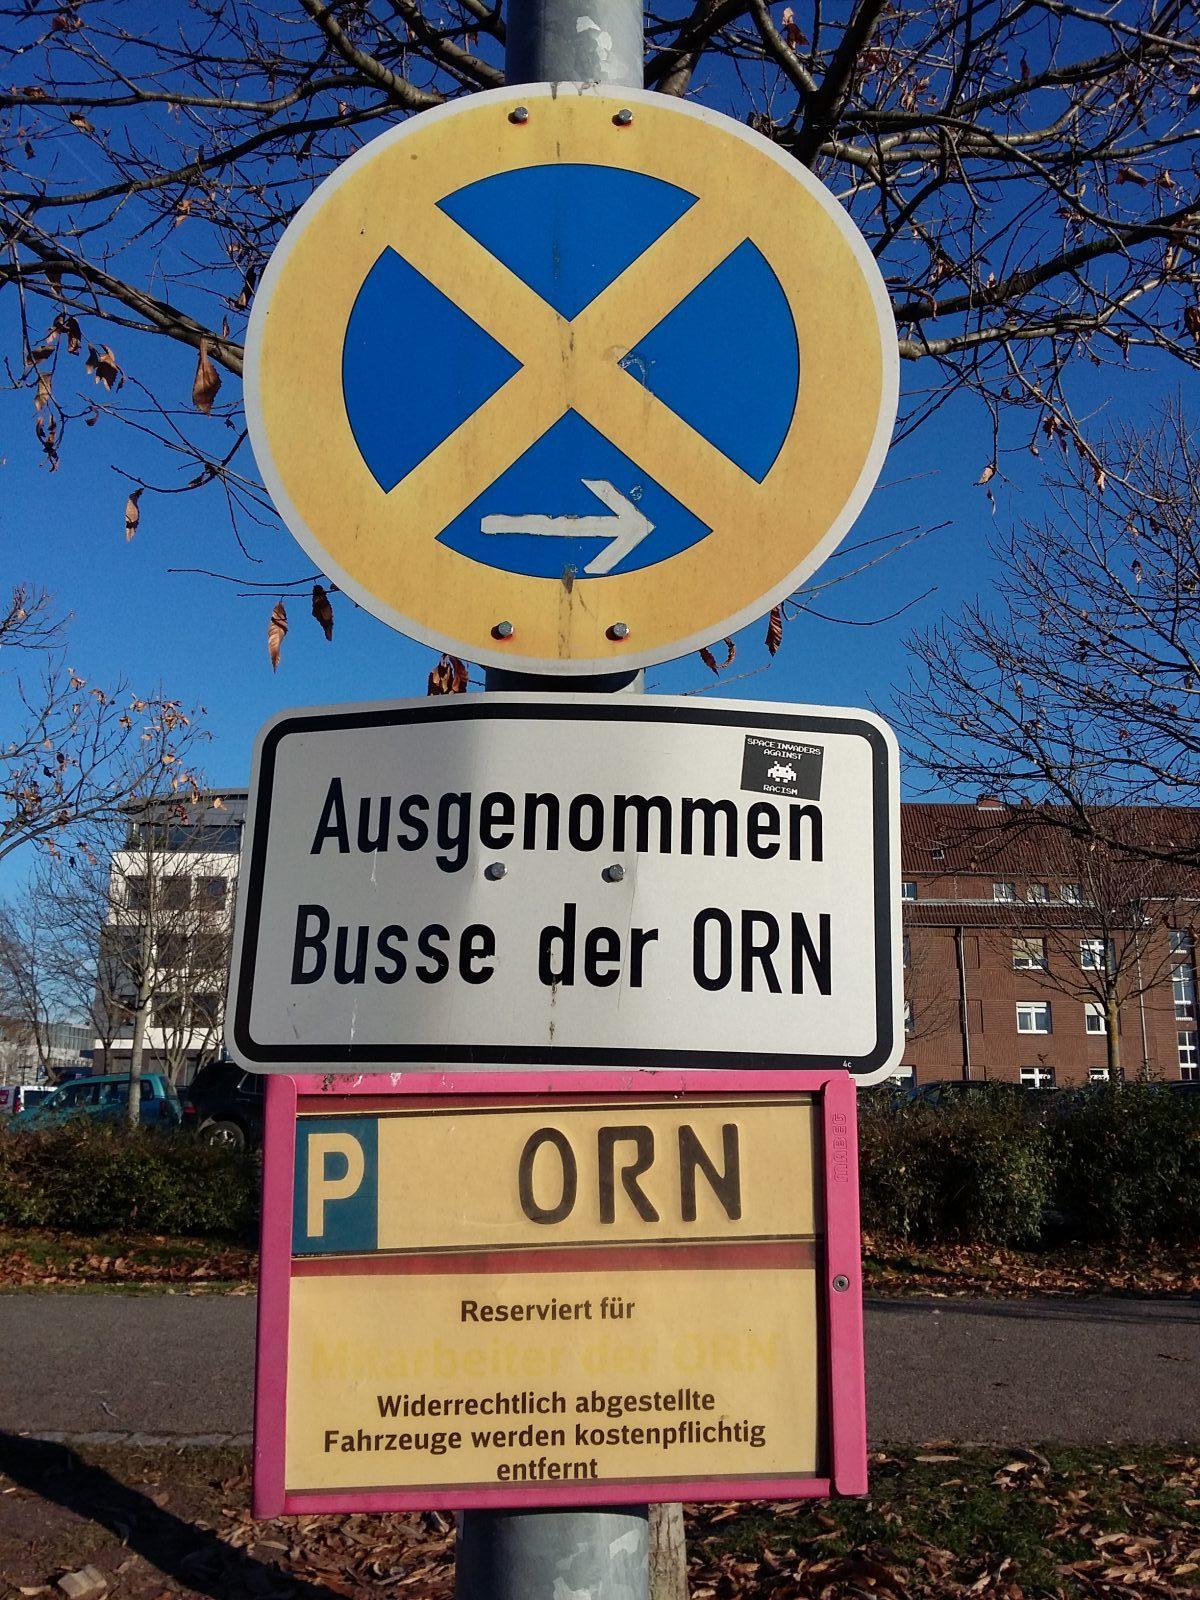 Servicepionier_Servicekomplize_Armin_Nagel_Orte_des_Grauens_Parkplatz (36)